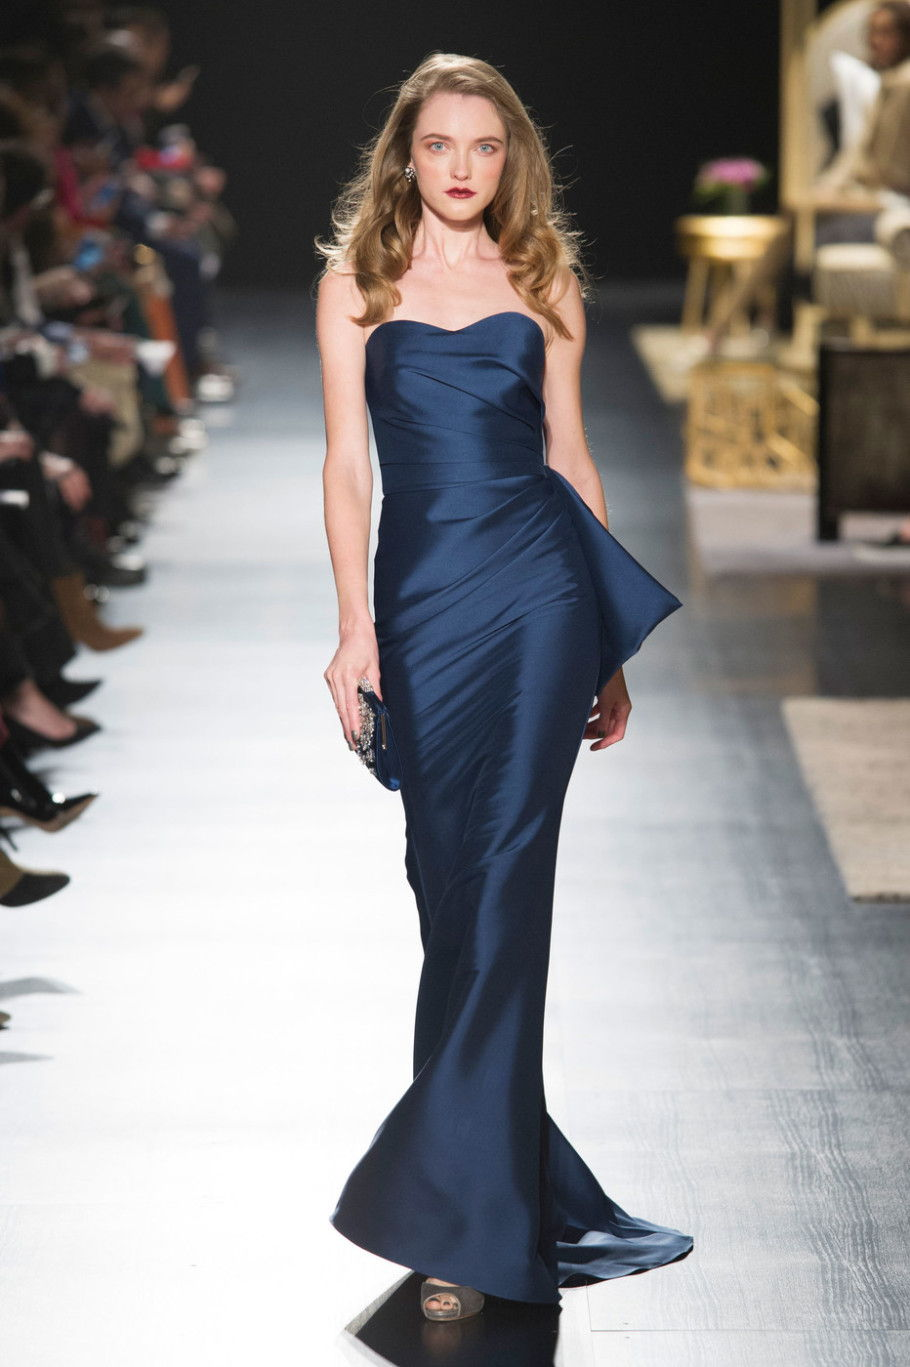 Классическое платье-русалка - тренд сезона осень-зима 2020-2021